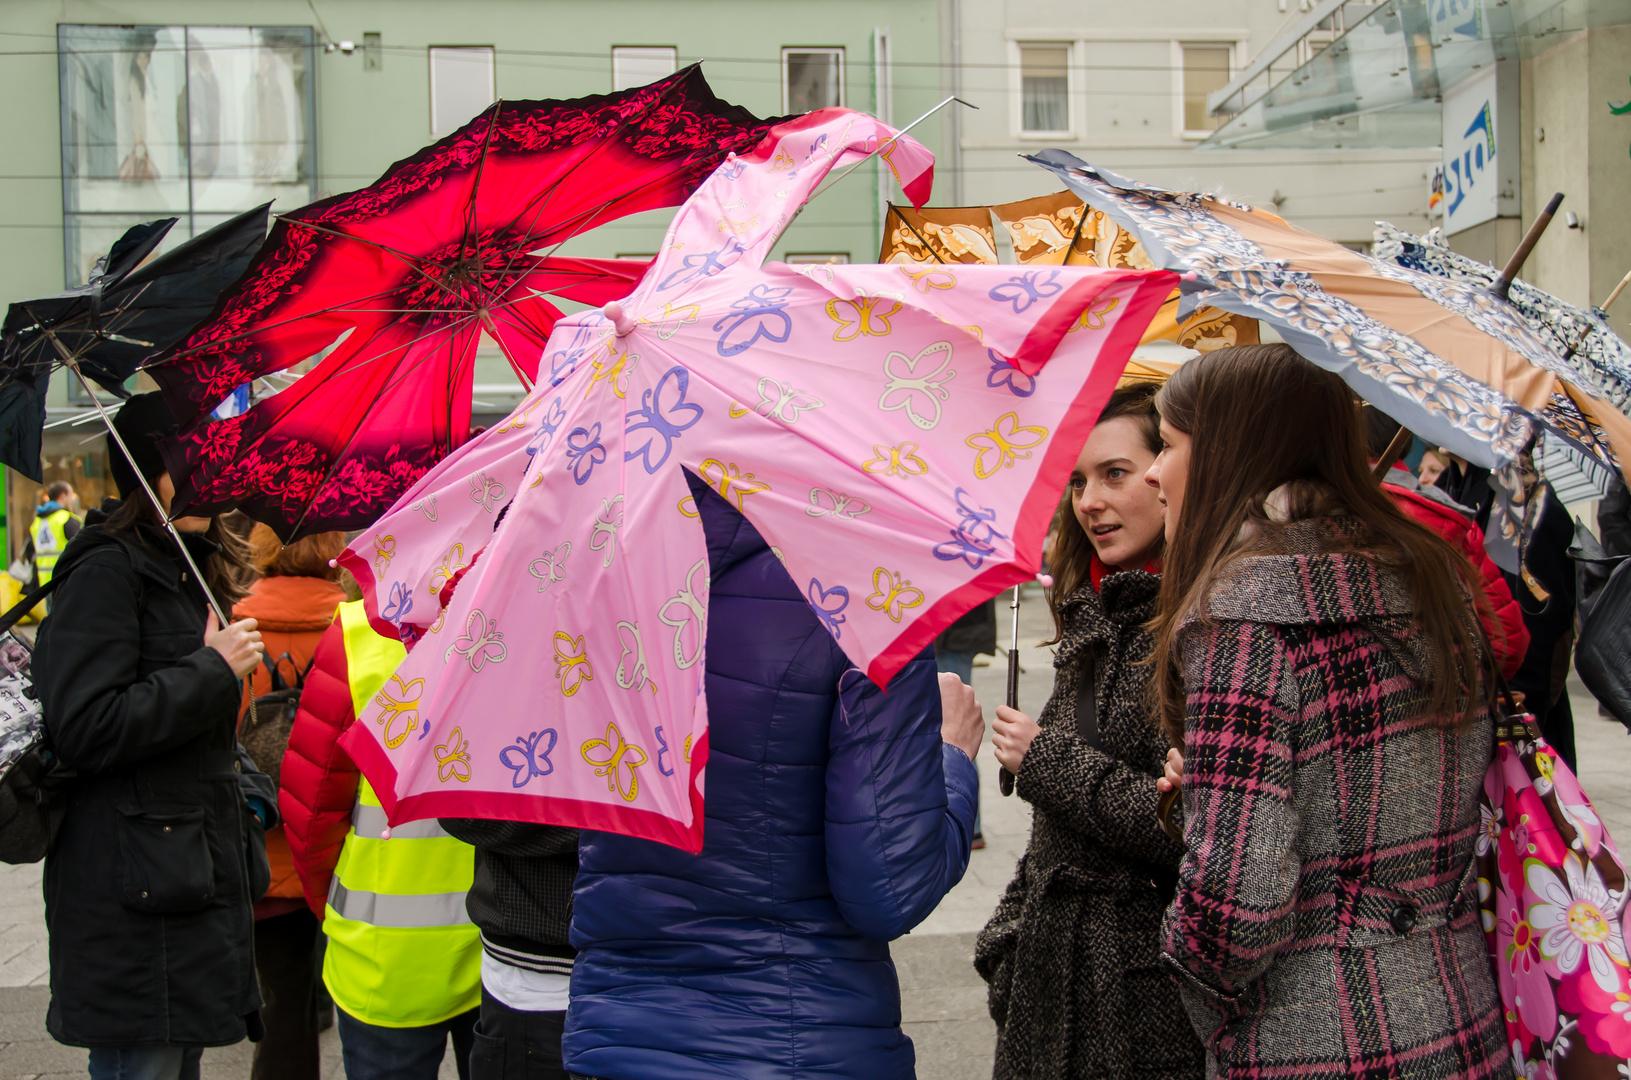 Ausgeflippte Regenschirme